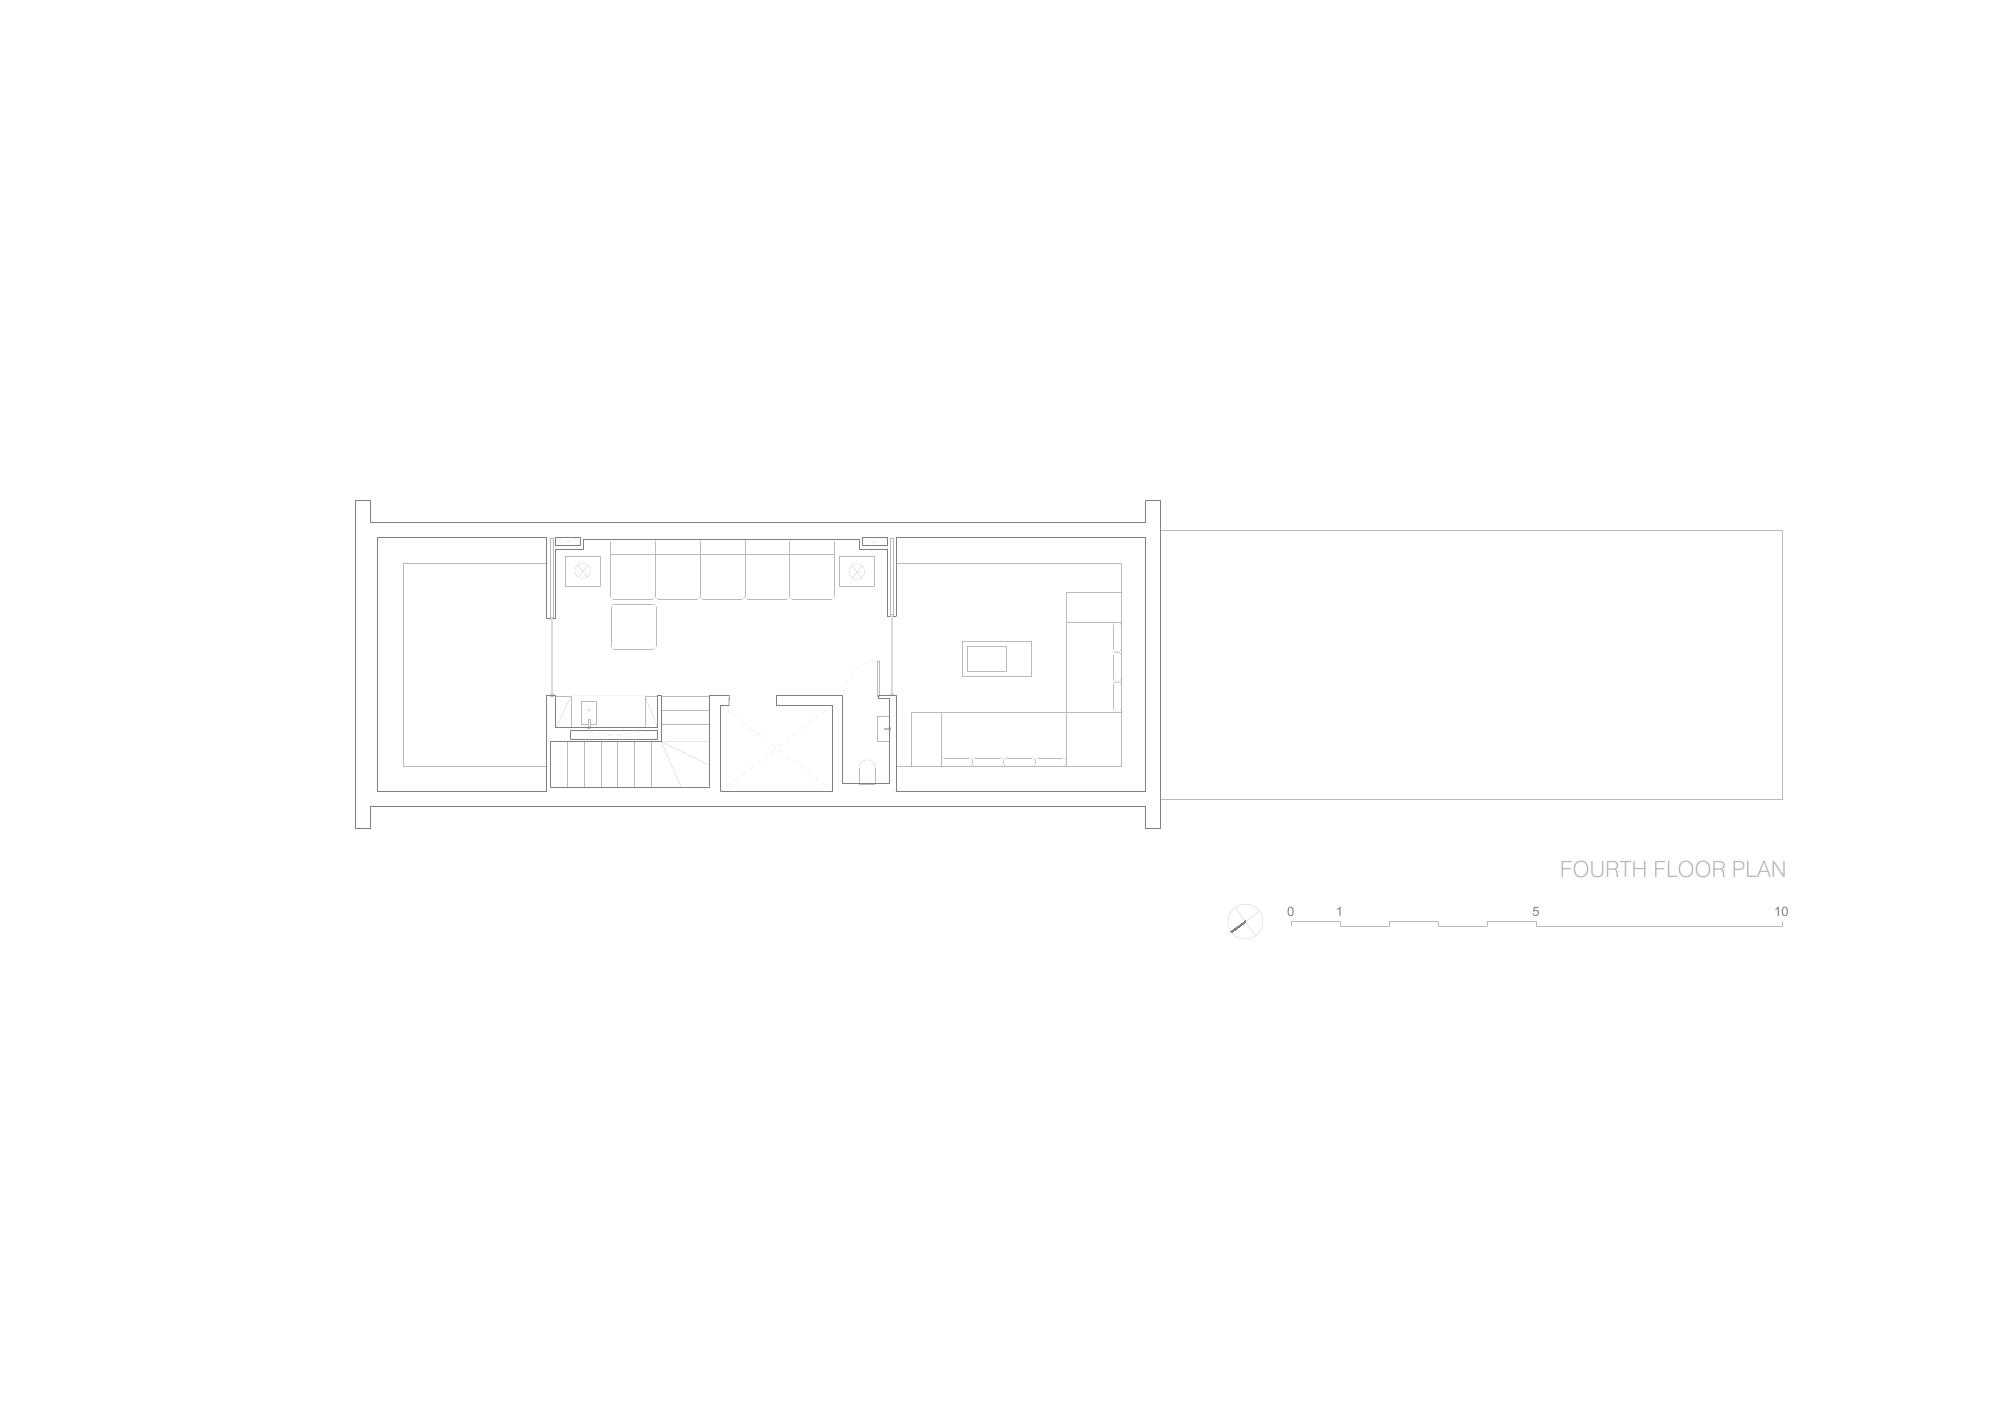 Brownstone Residence - Fourth Floor Plan STUDIO ARTHUR CASAS}